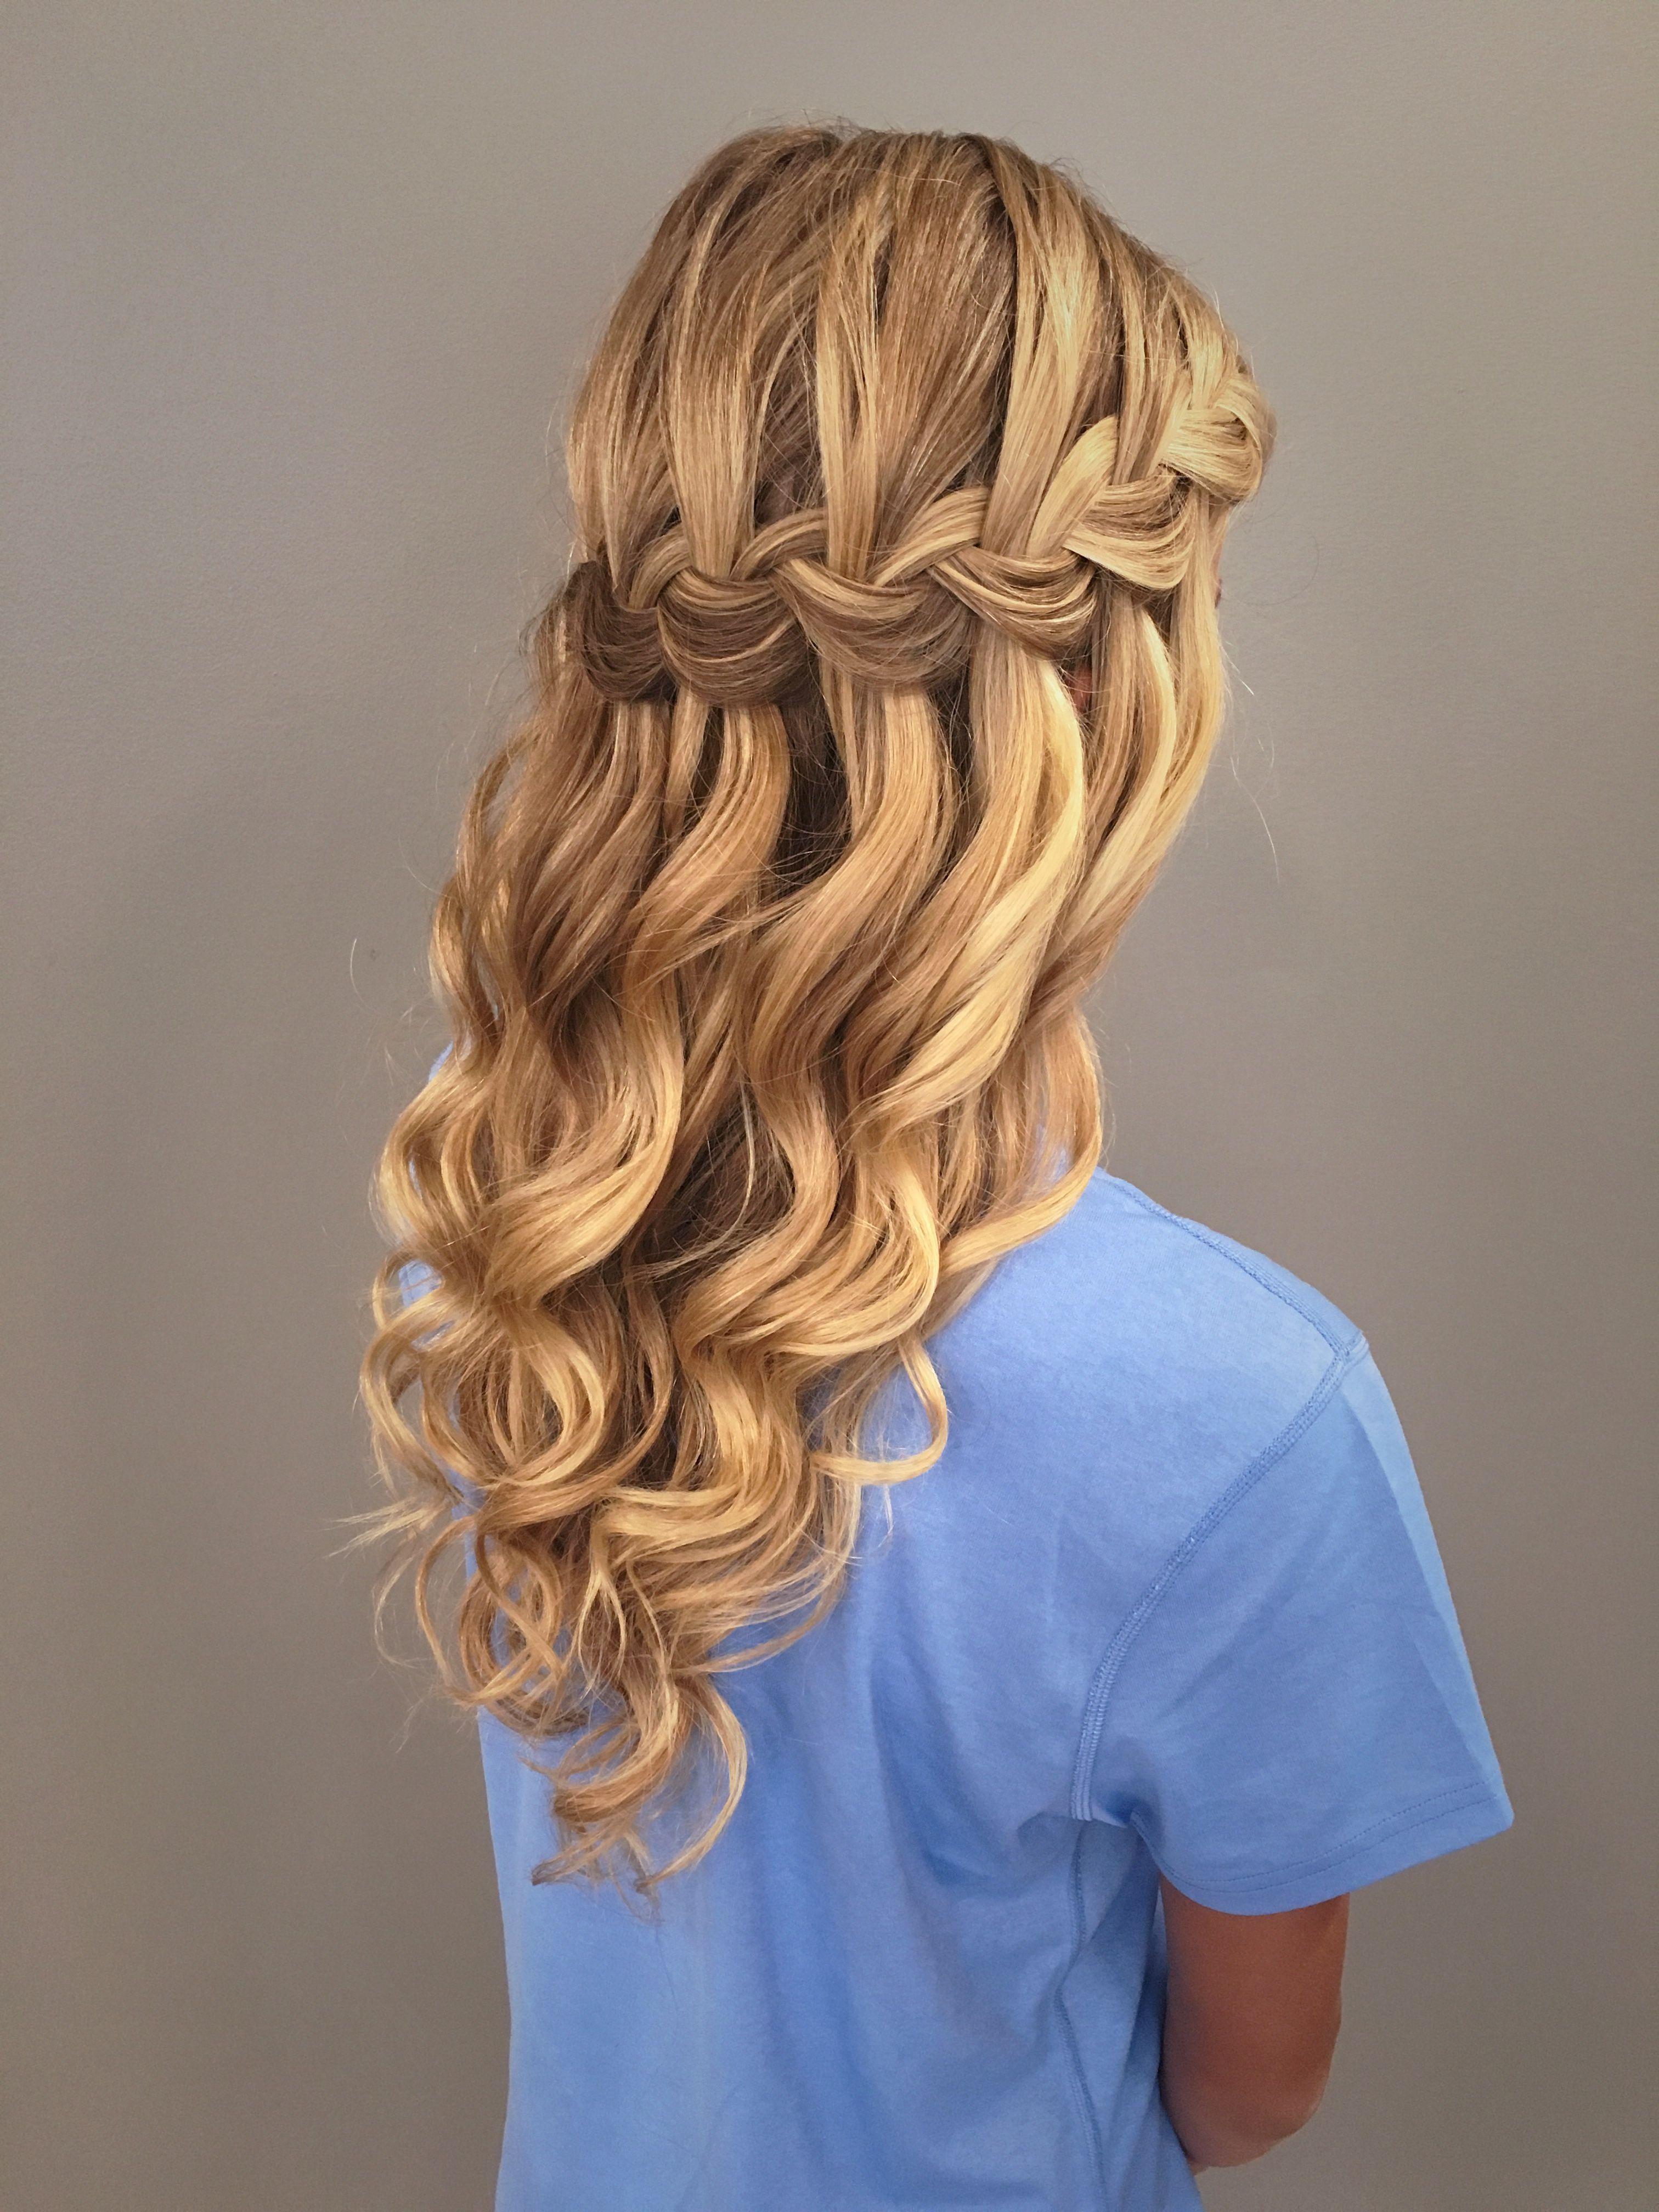 Waterfall braid with mermaid waves Great bridal prom or